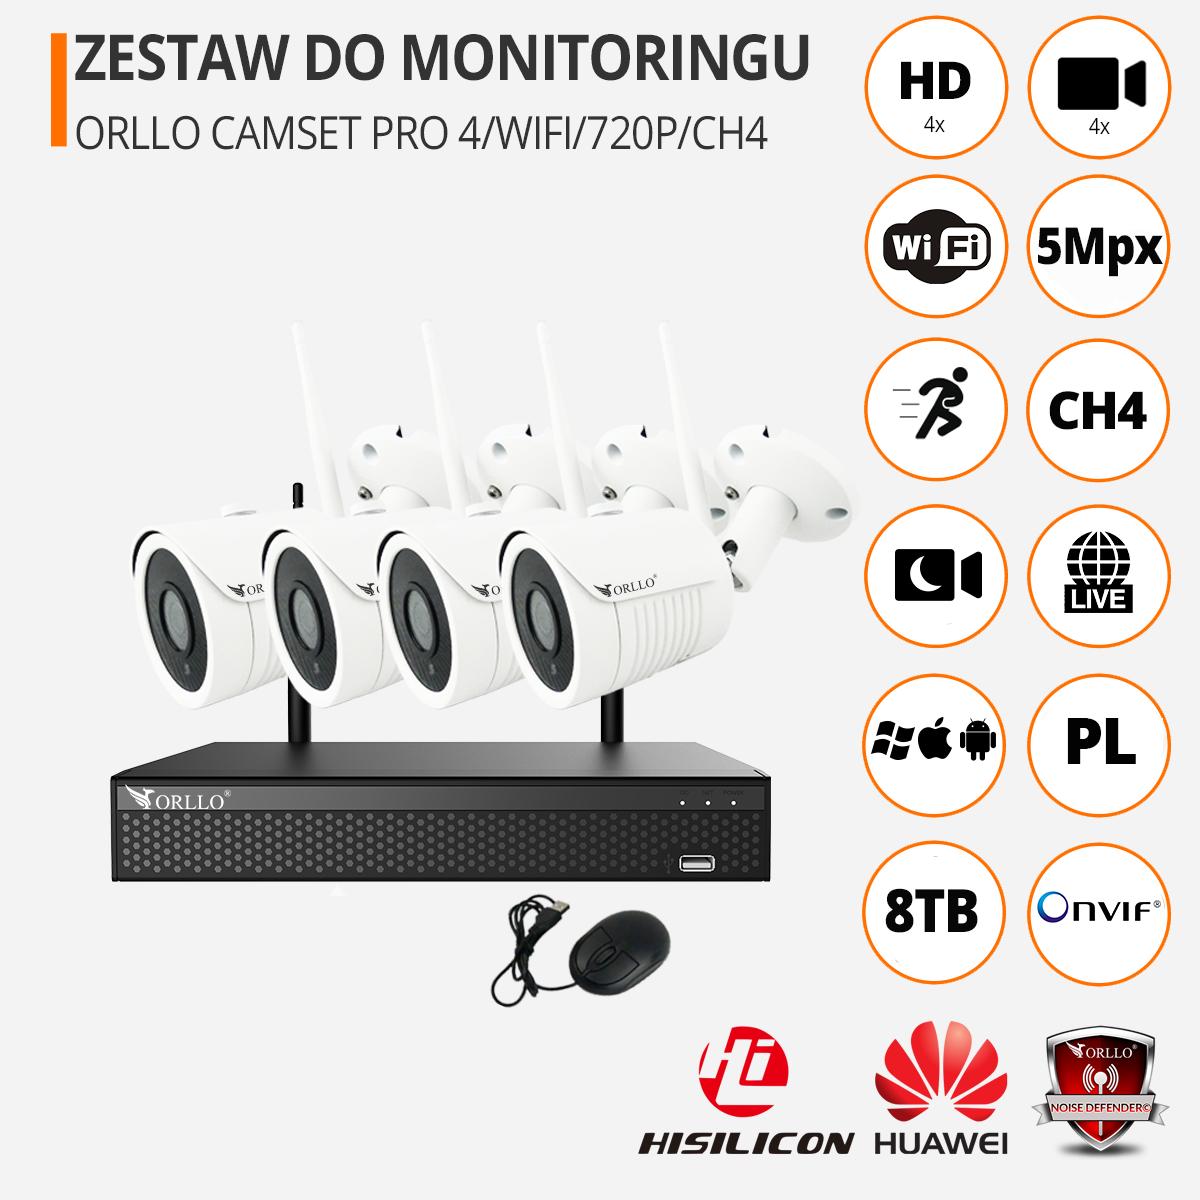 Zestaw-kamer-do-monitoringu-CAMSET-funkcje-orllo-pl